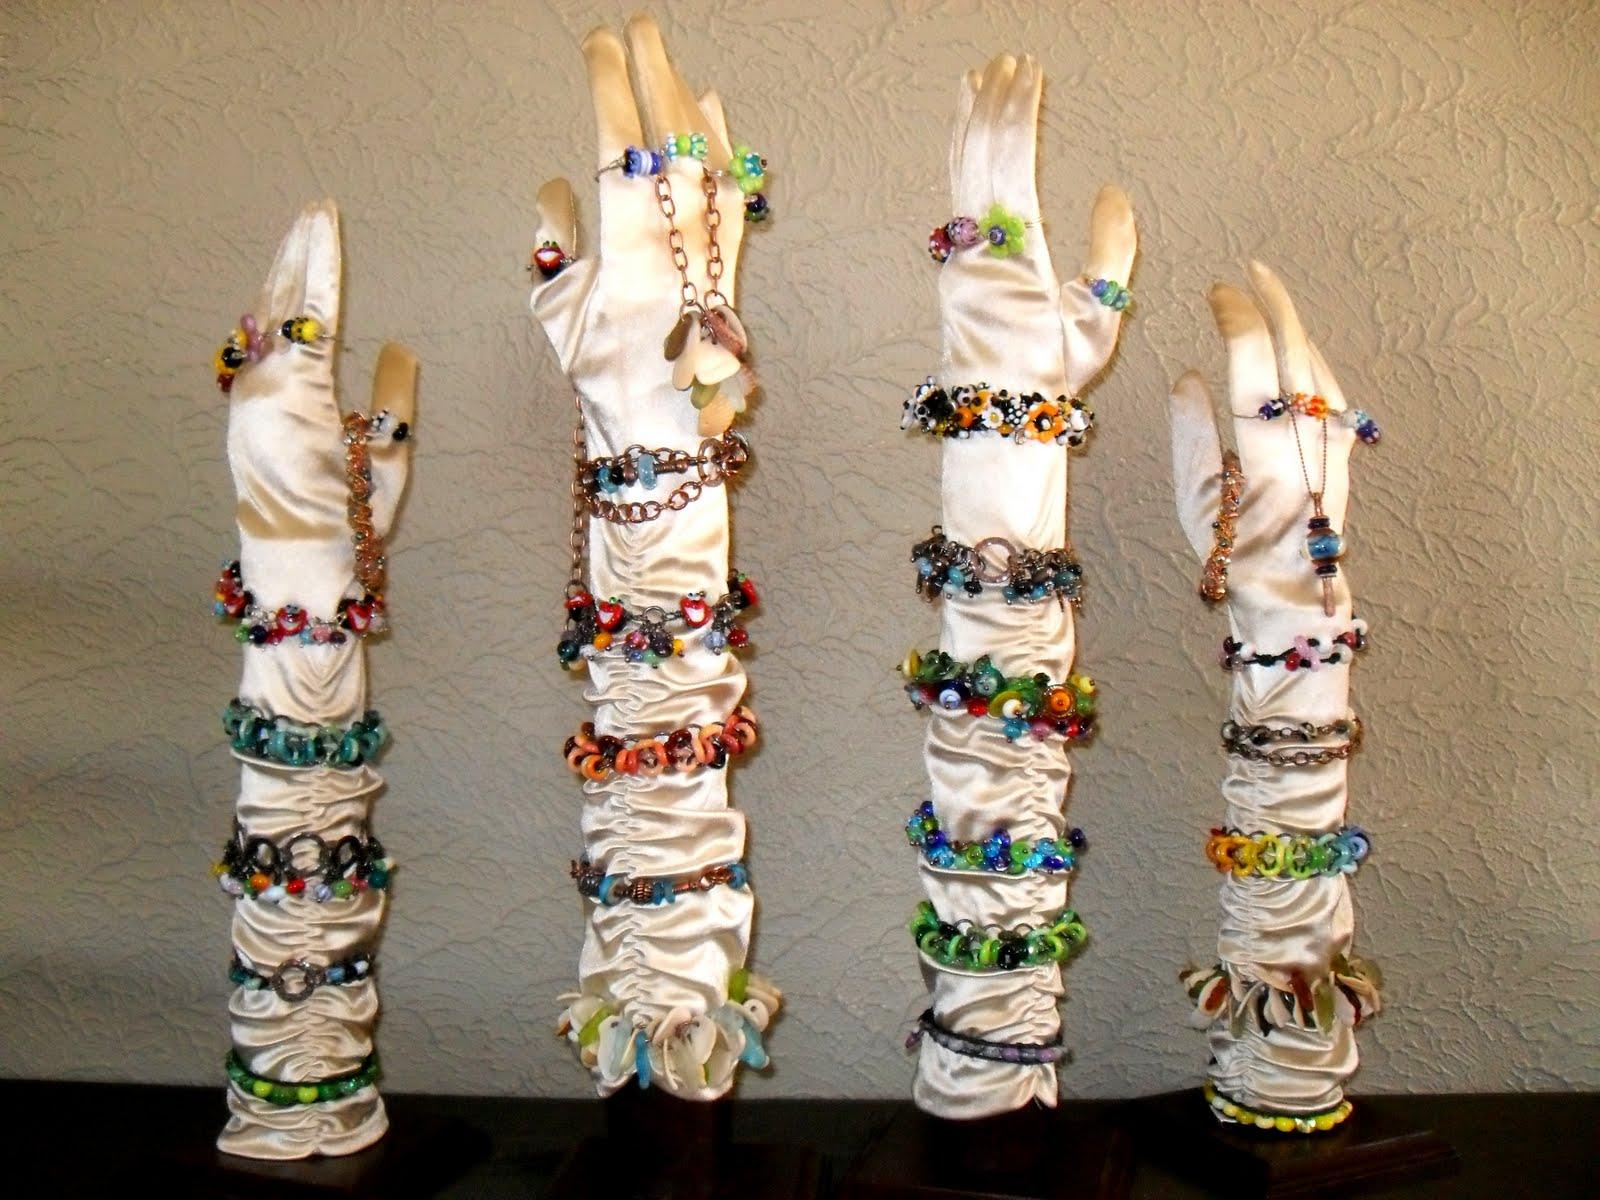 Bracelet Display Ideas For Craft Shows